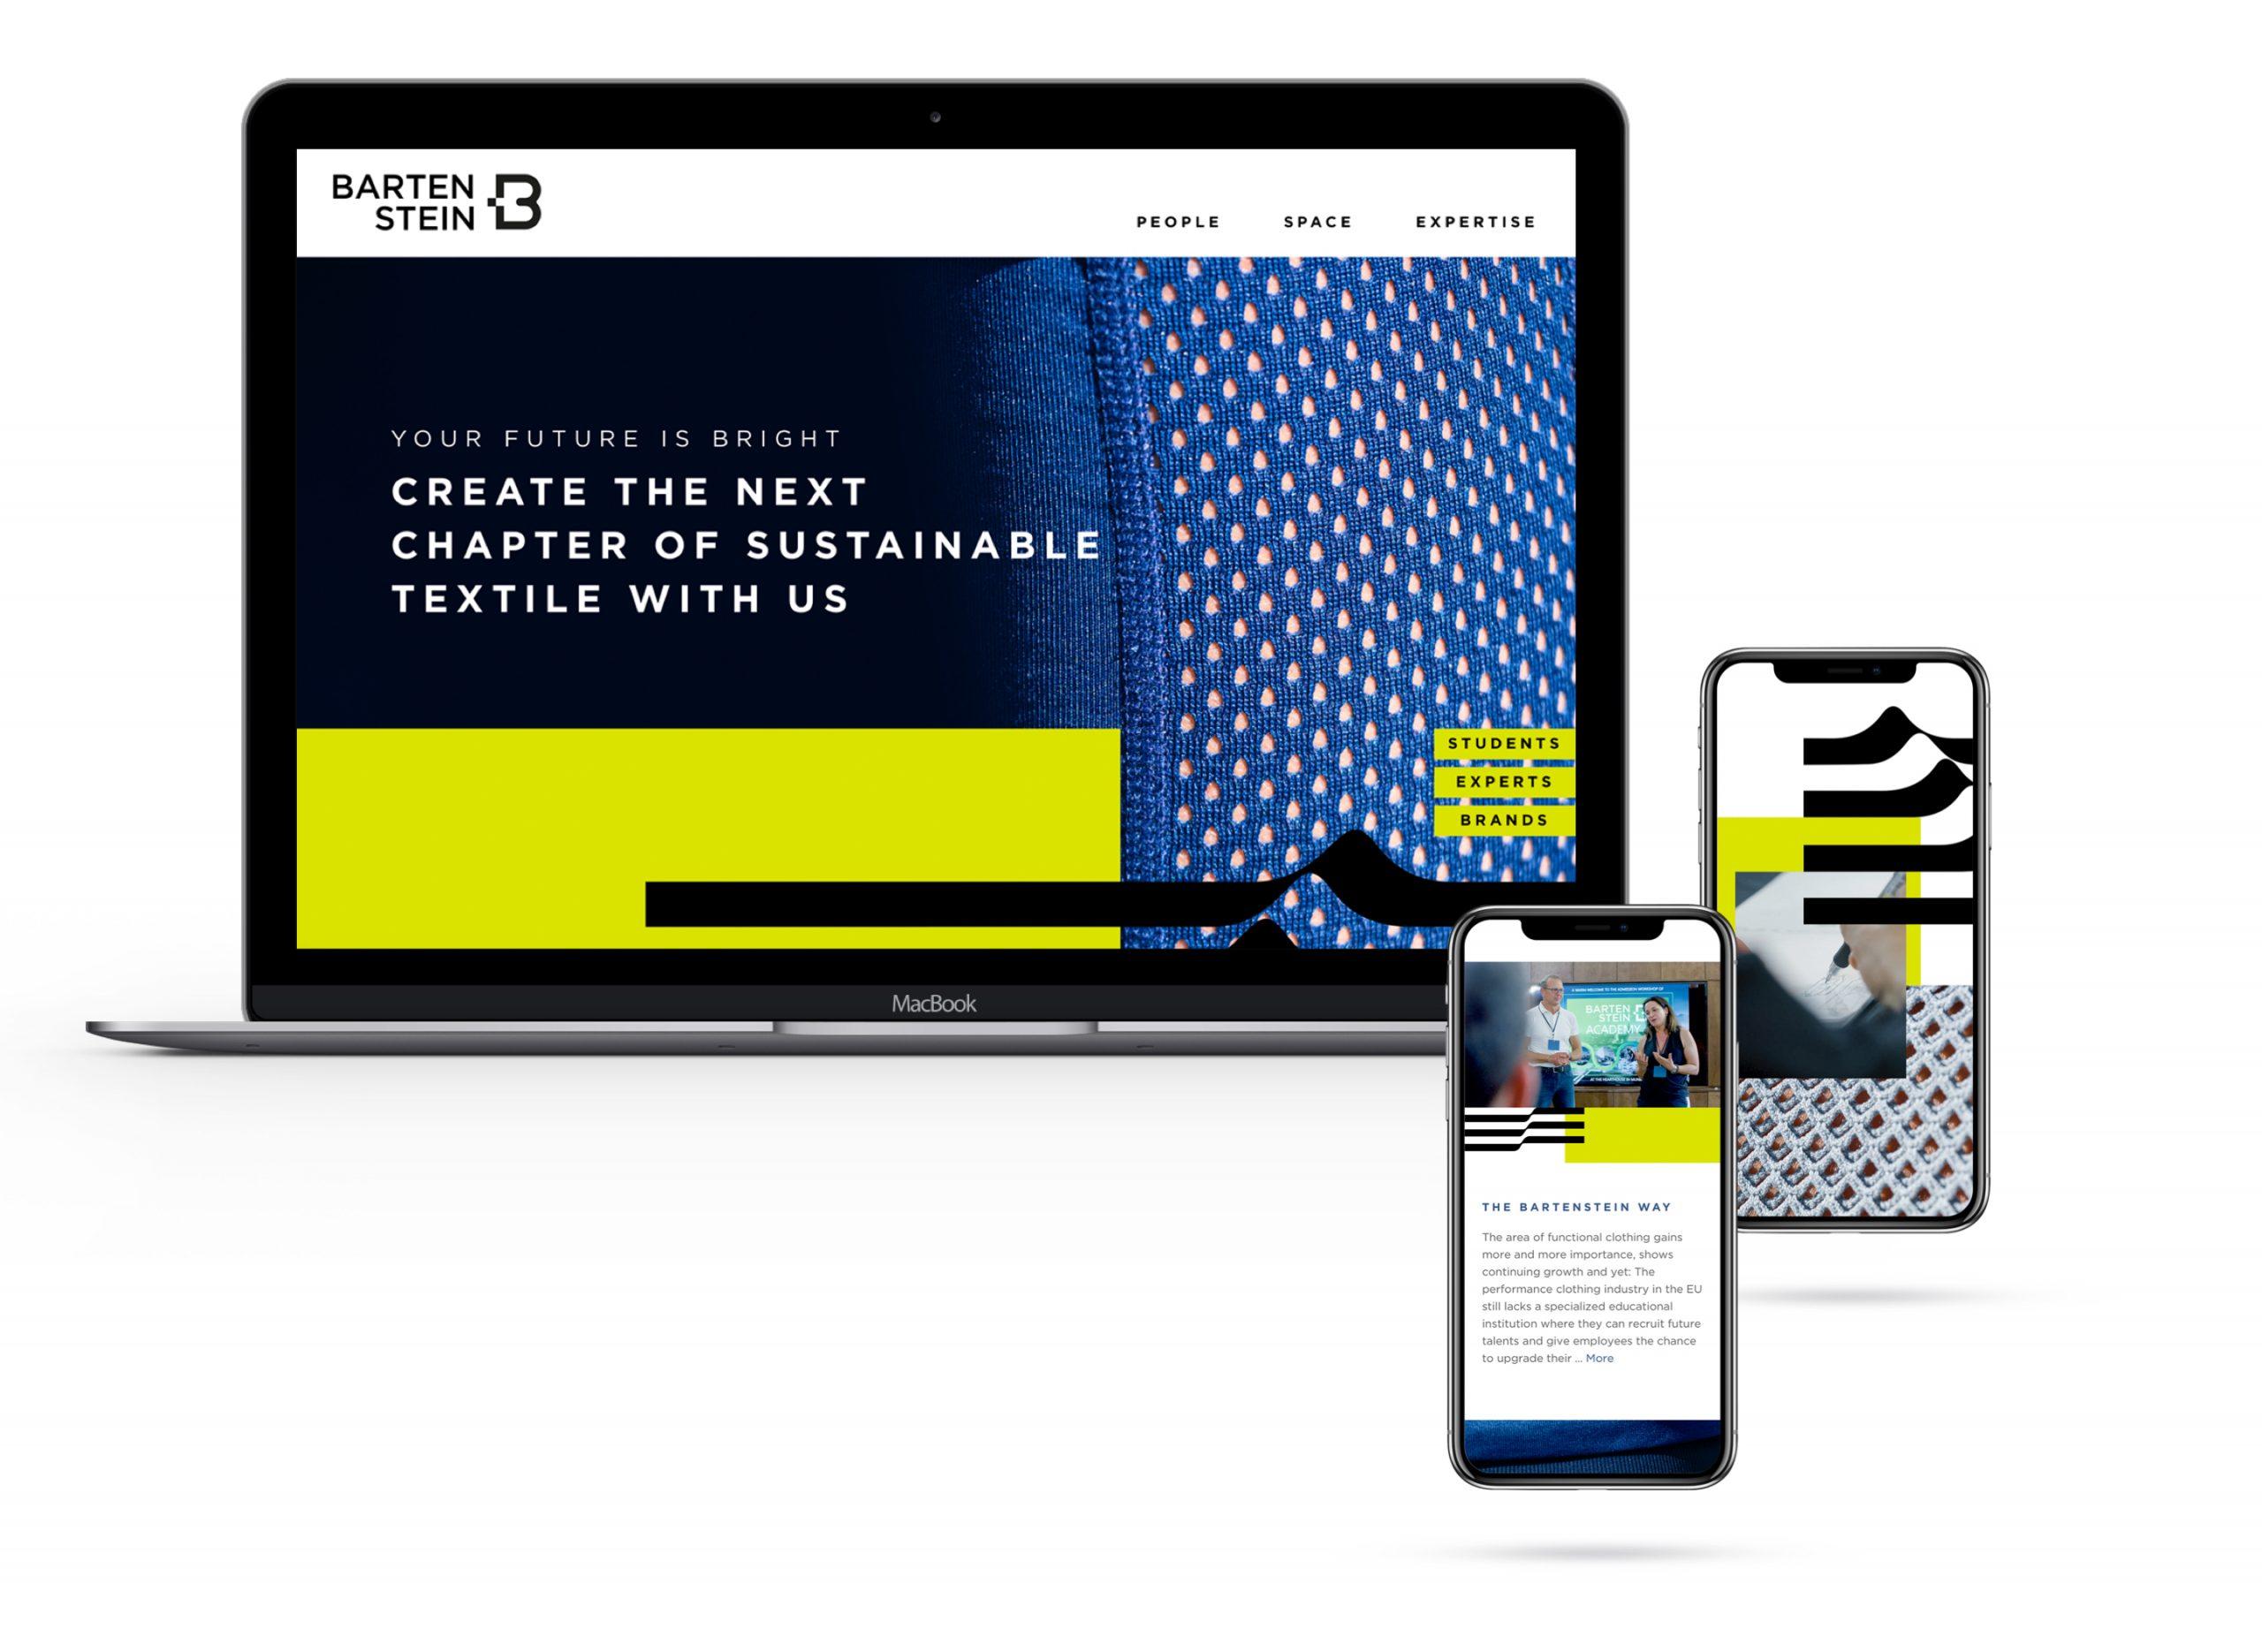 pascher-heinz-bartenstein-relaunch-web